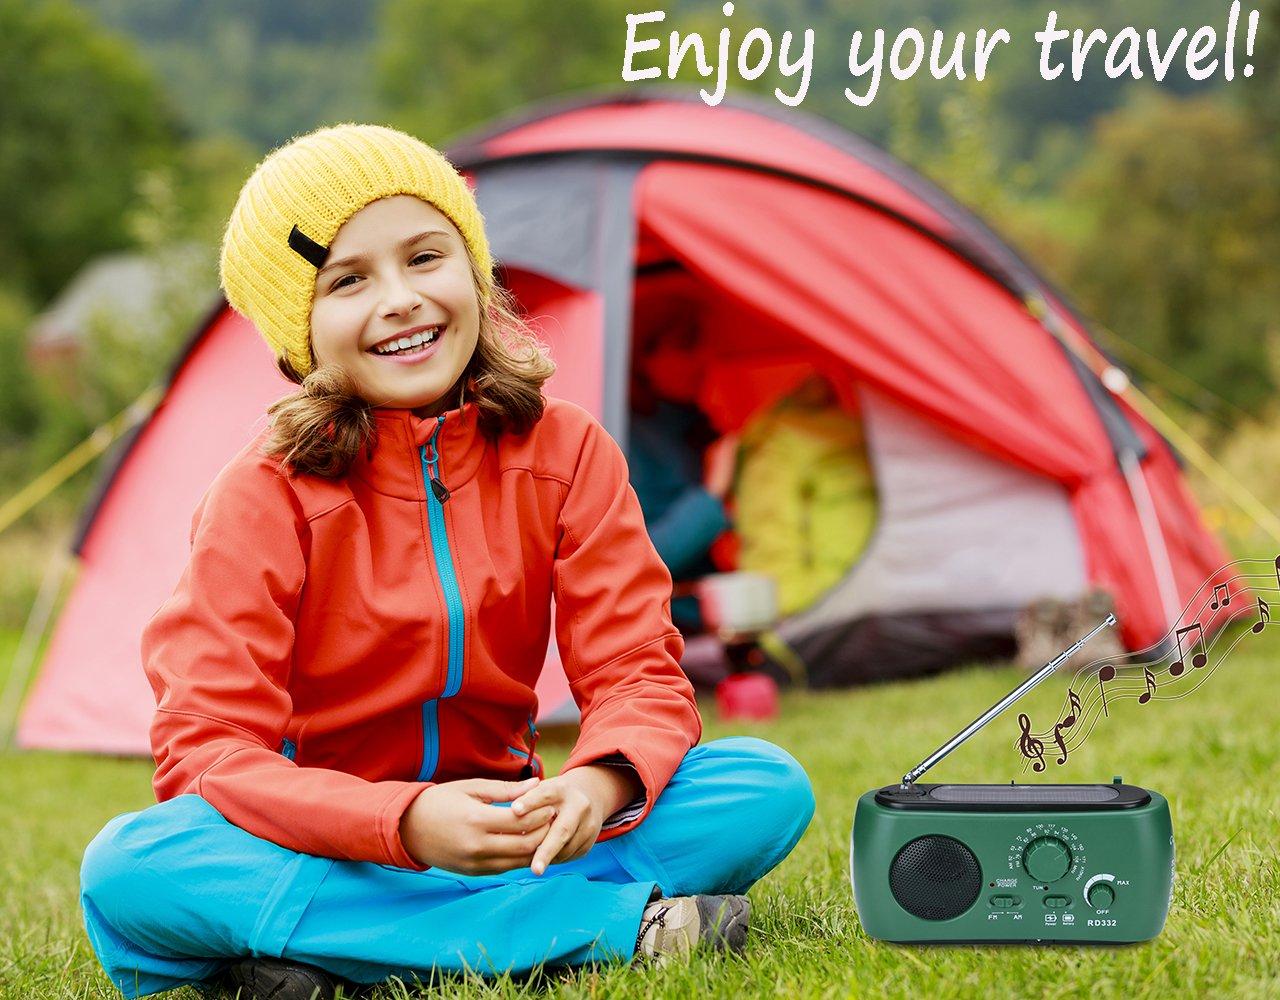 Frostory Solar Dynamo Hand Crank LED Flashlight FM/AM Radio with Emergency Power Bank Survival Kit 332FS (Green) by Frostory (Image #5)